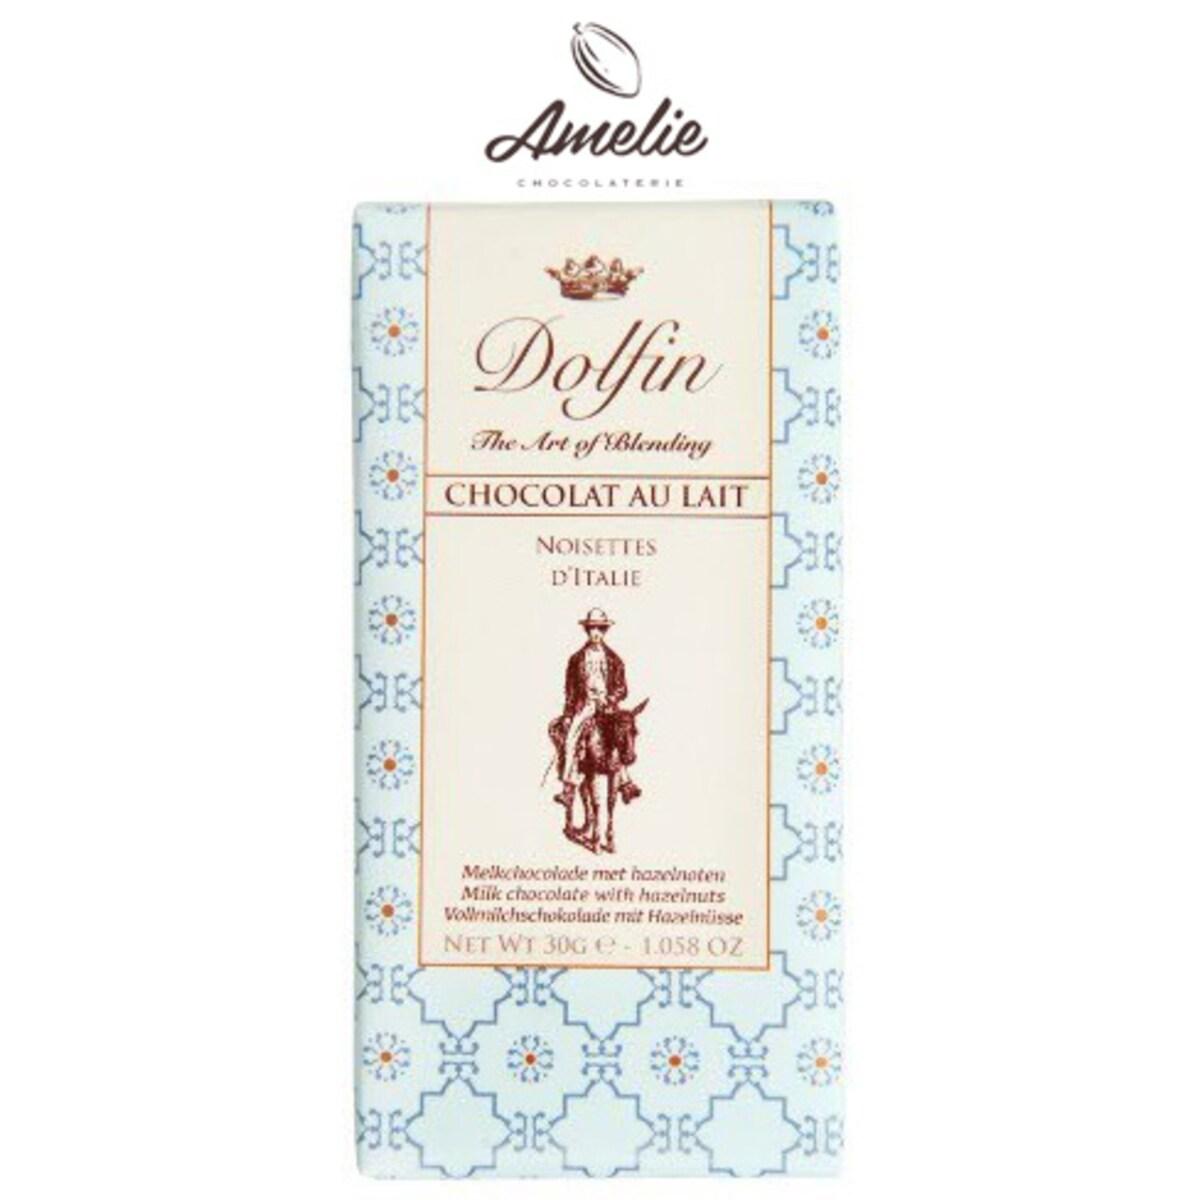 Dolfin Milk with Hazelnuts from Italy